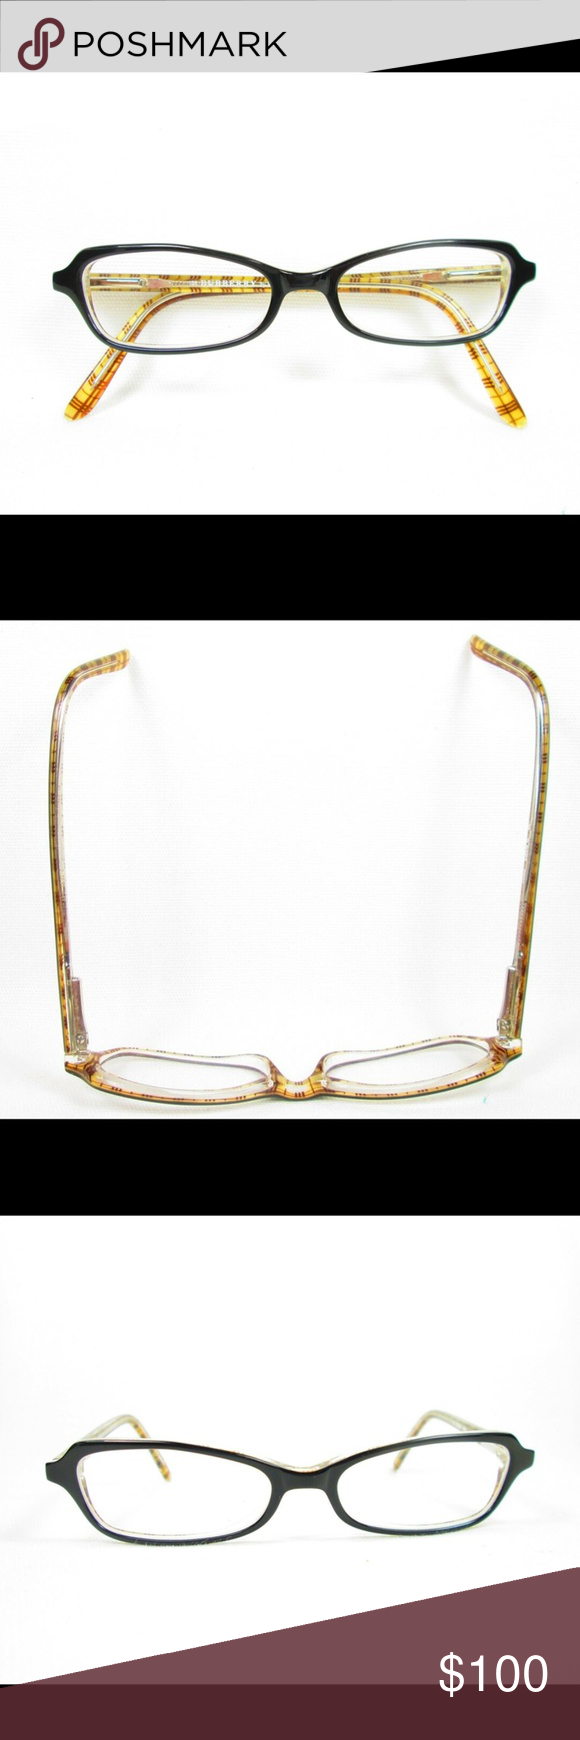 Rx Eyeglasses by Burberry Rx eyeglasses, Burberry